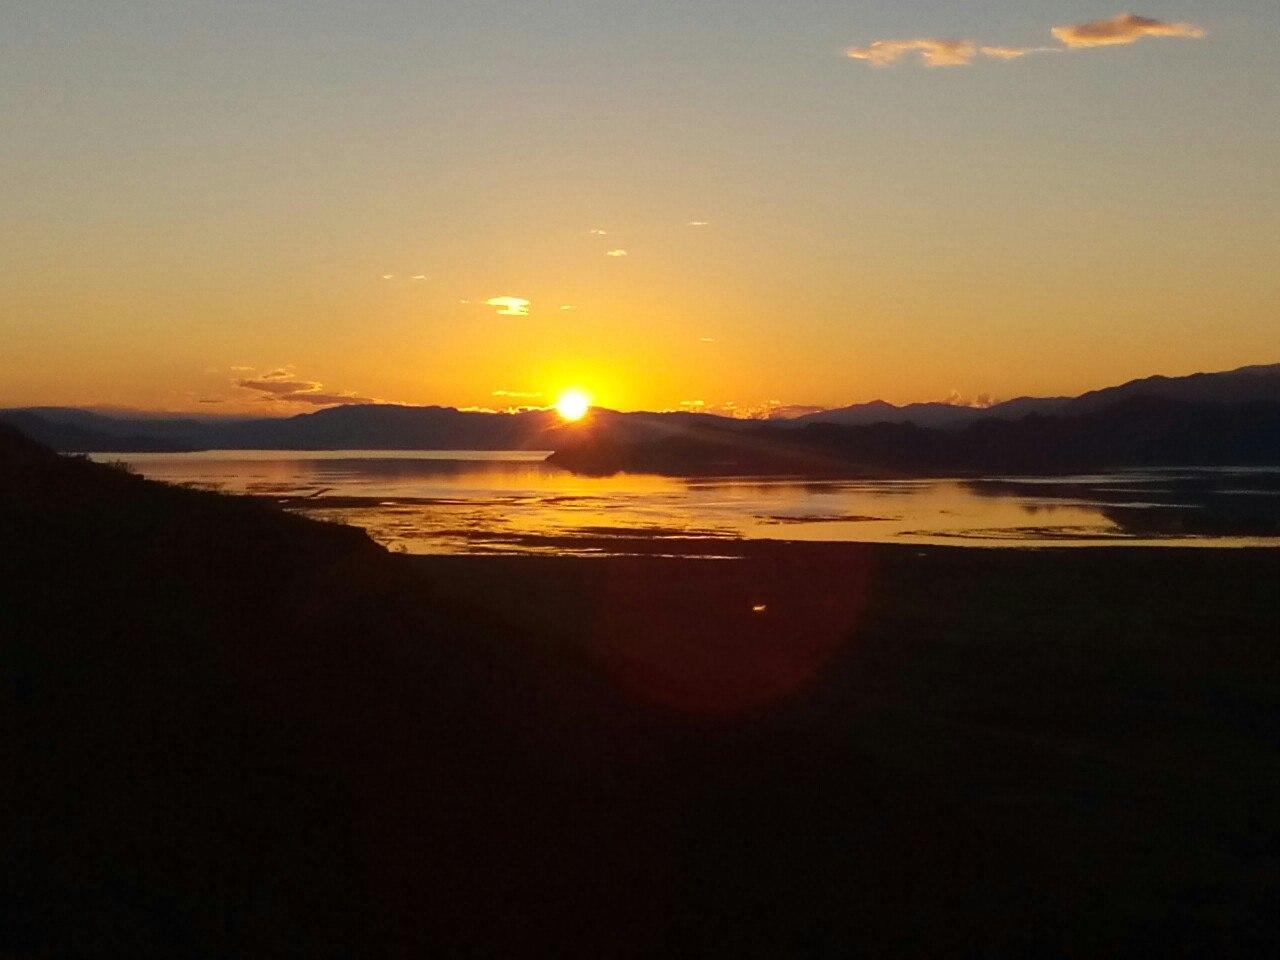 Саяно-Шушенское водохранилище, Республика Тува, фото